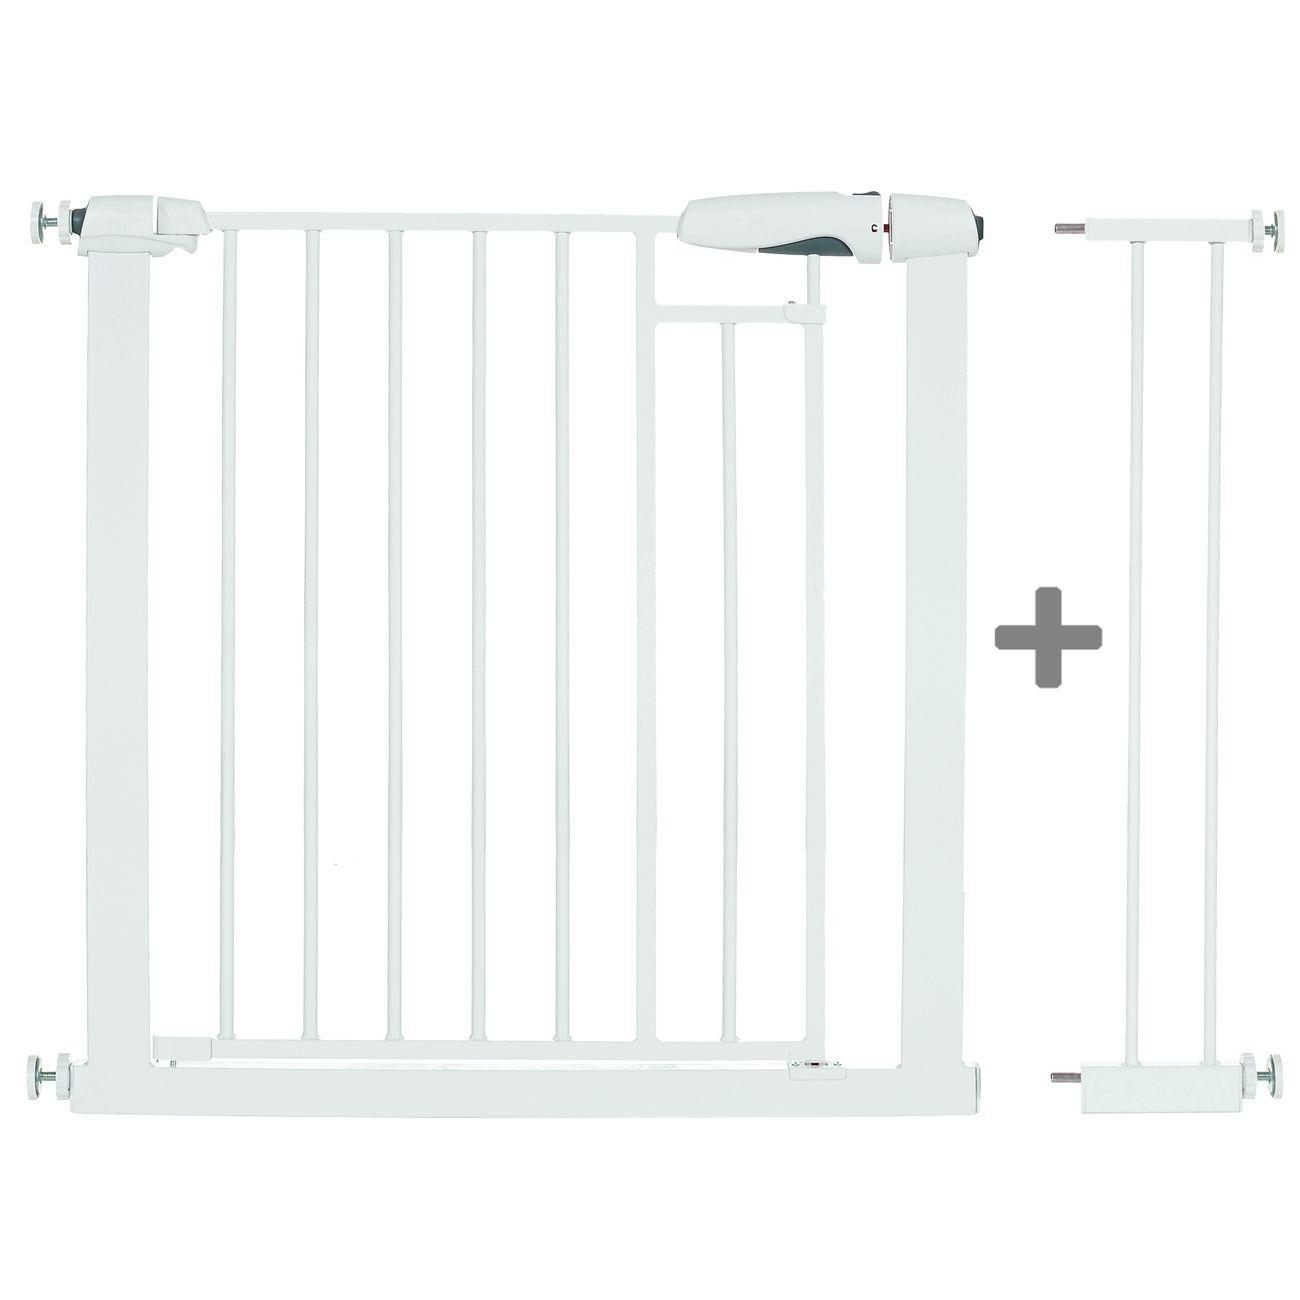 treppengitter treppenschutzgitter t rgitter auto close ohne bohren 76 97 cm ebay. Black Bedroom Furniture Sets. Home Design Ideas